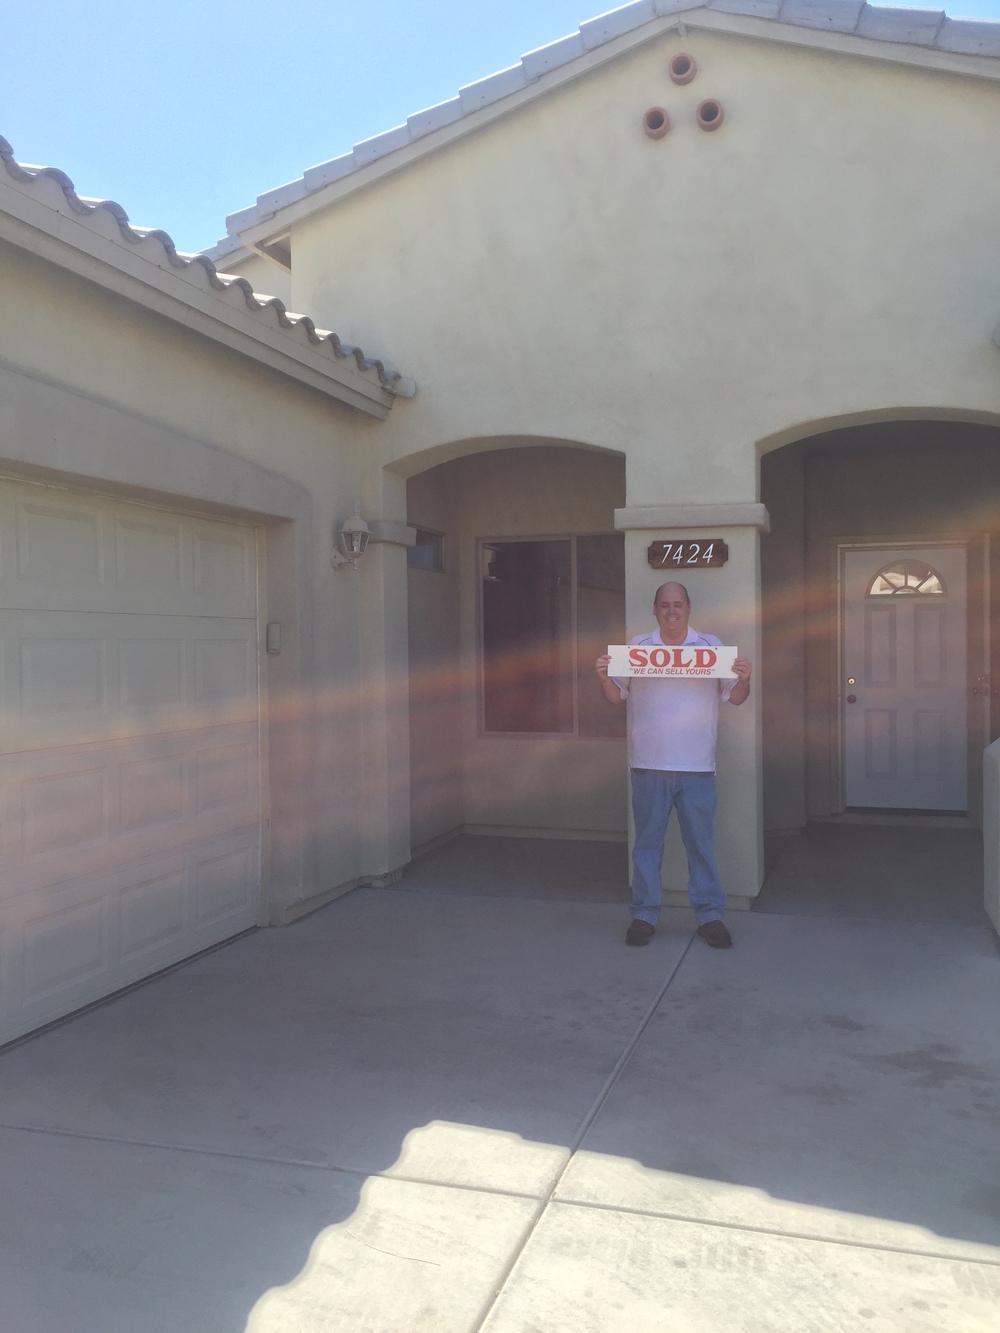 7424 S 15th Dr, Phoenix AZ, 85041